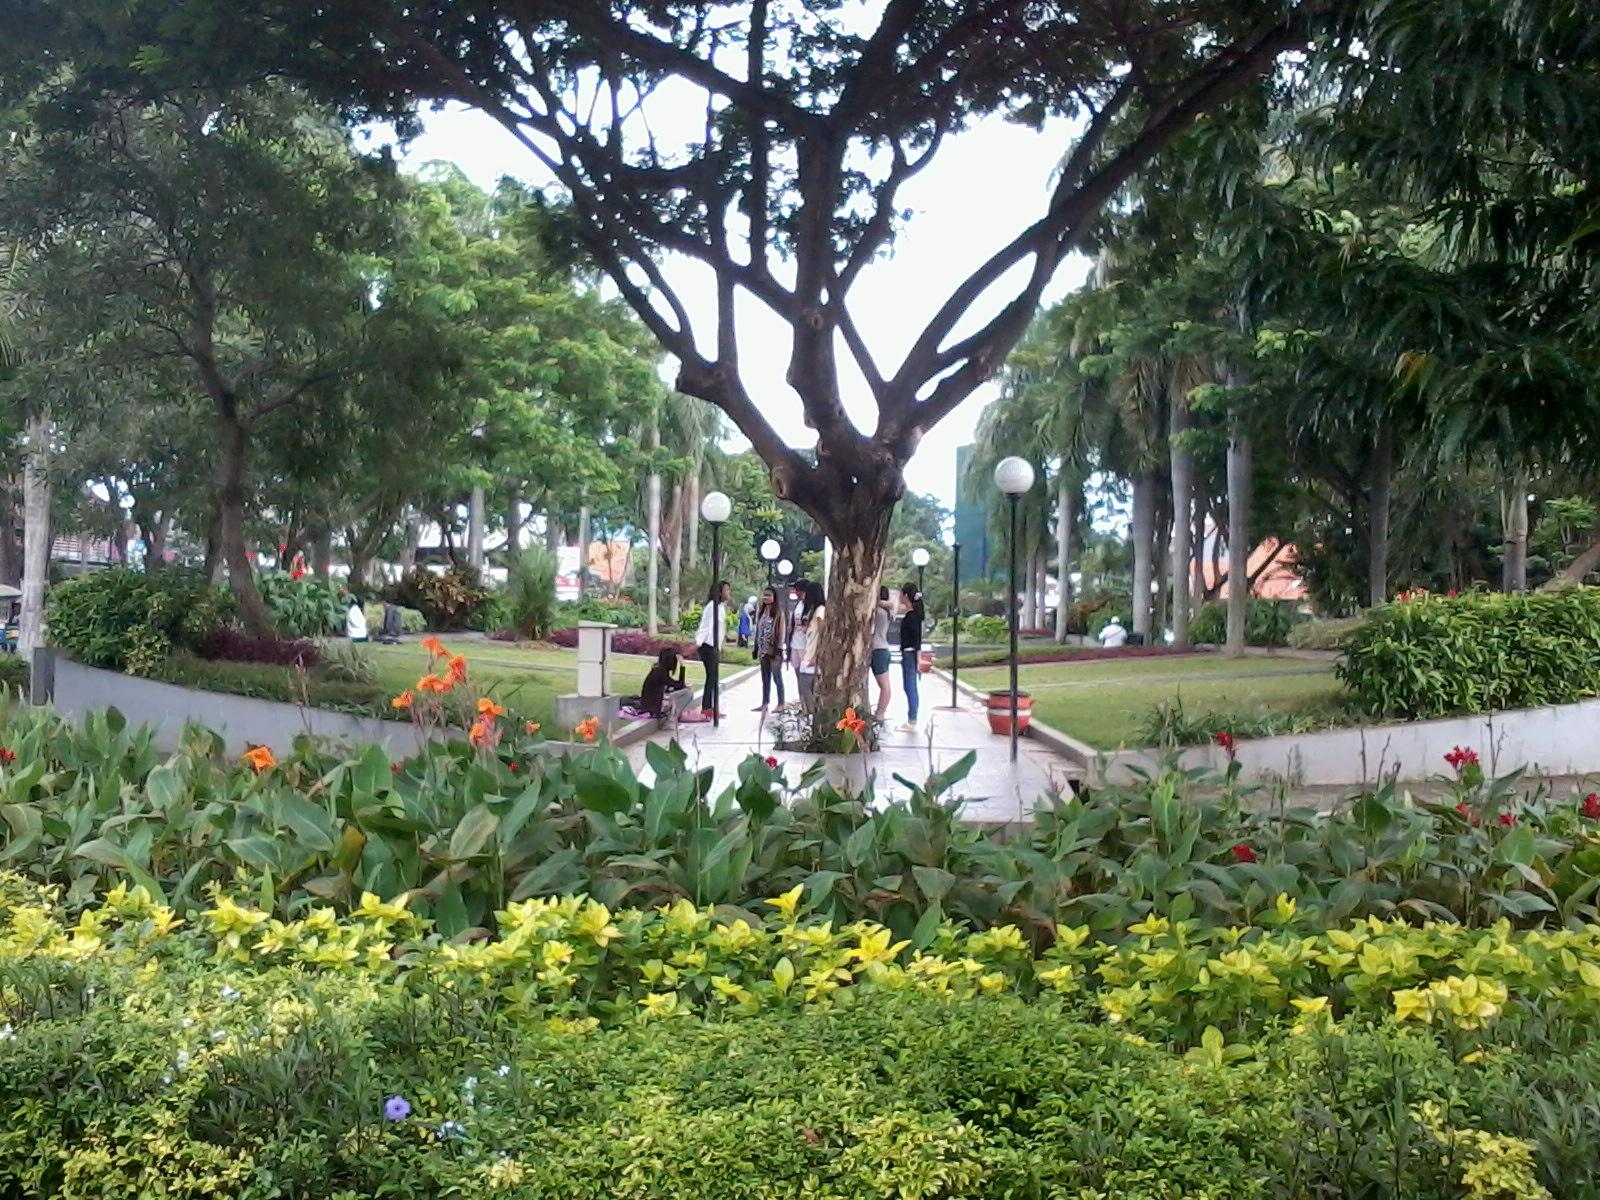 Intaps Reading Club Keindahan Korea Ala Surabaya Kota Taman Dr